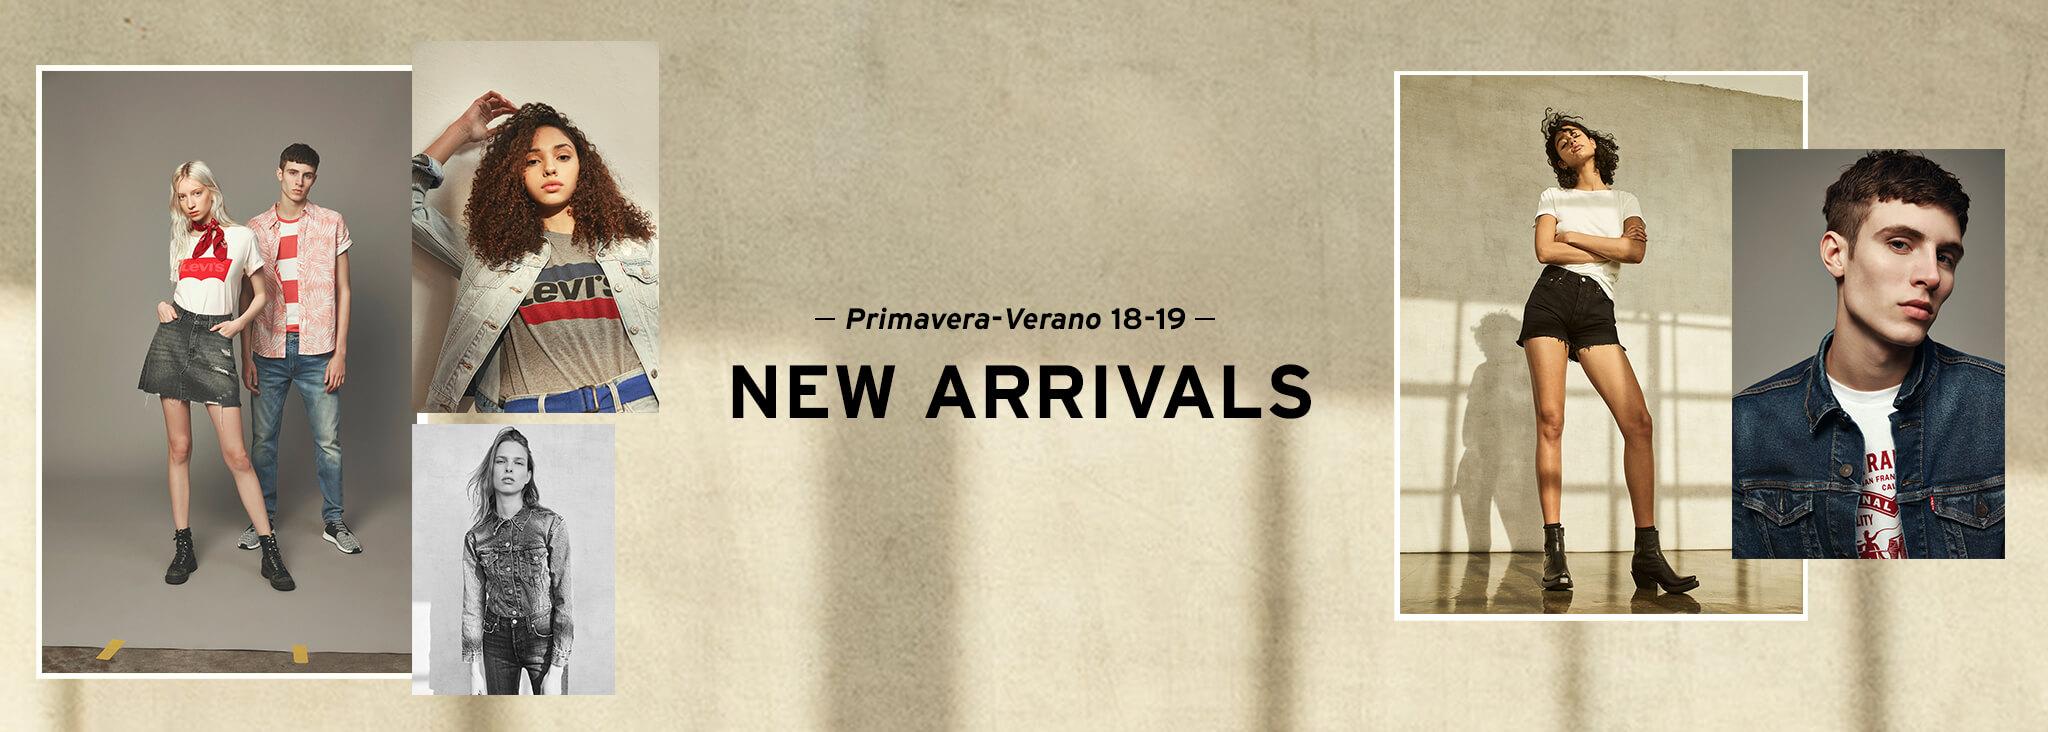 New arrivals 2018 primavera verano mujer levis argentina